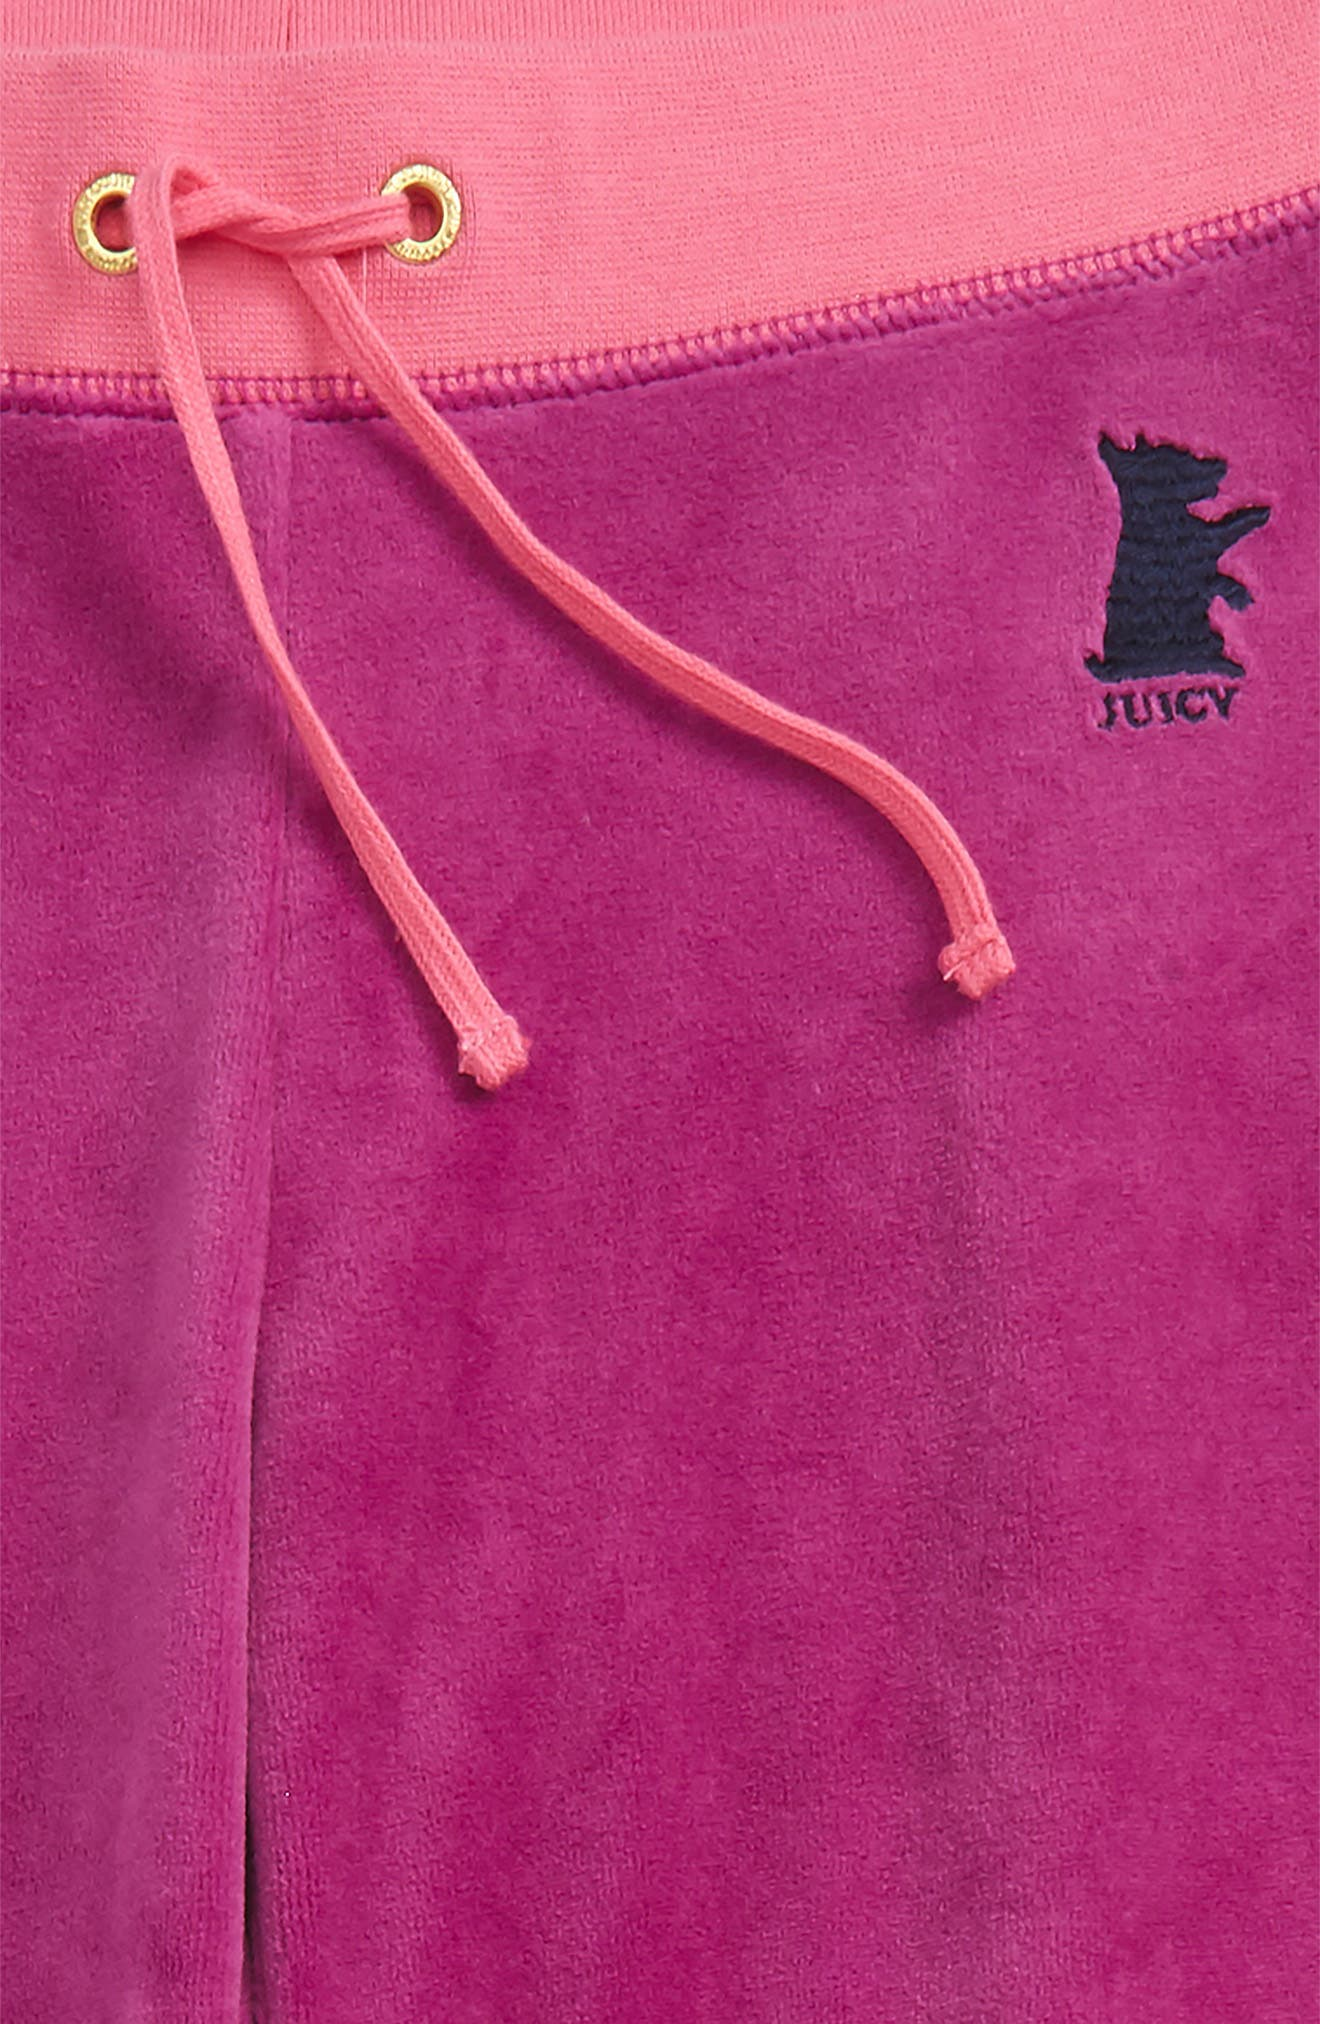 Zuma Velour Pants,                             Alternate thumbnail 2, color,                             Boysenberry